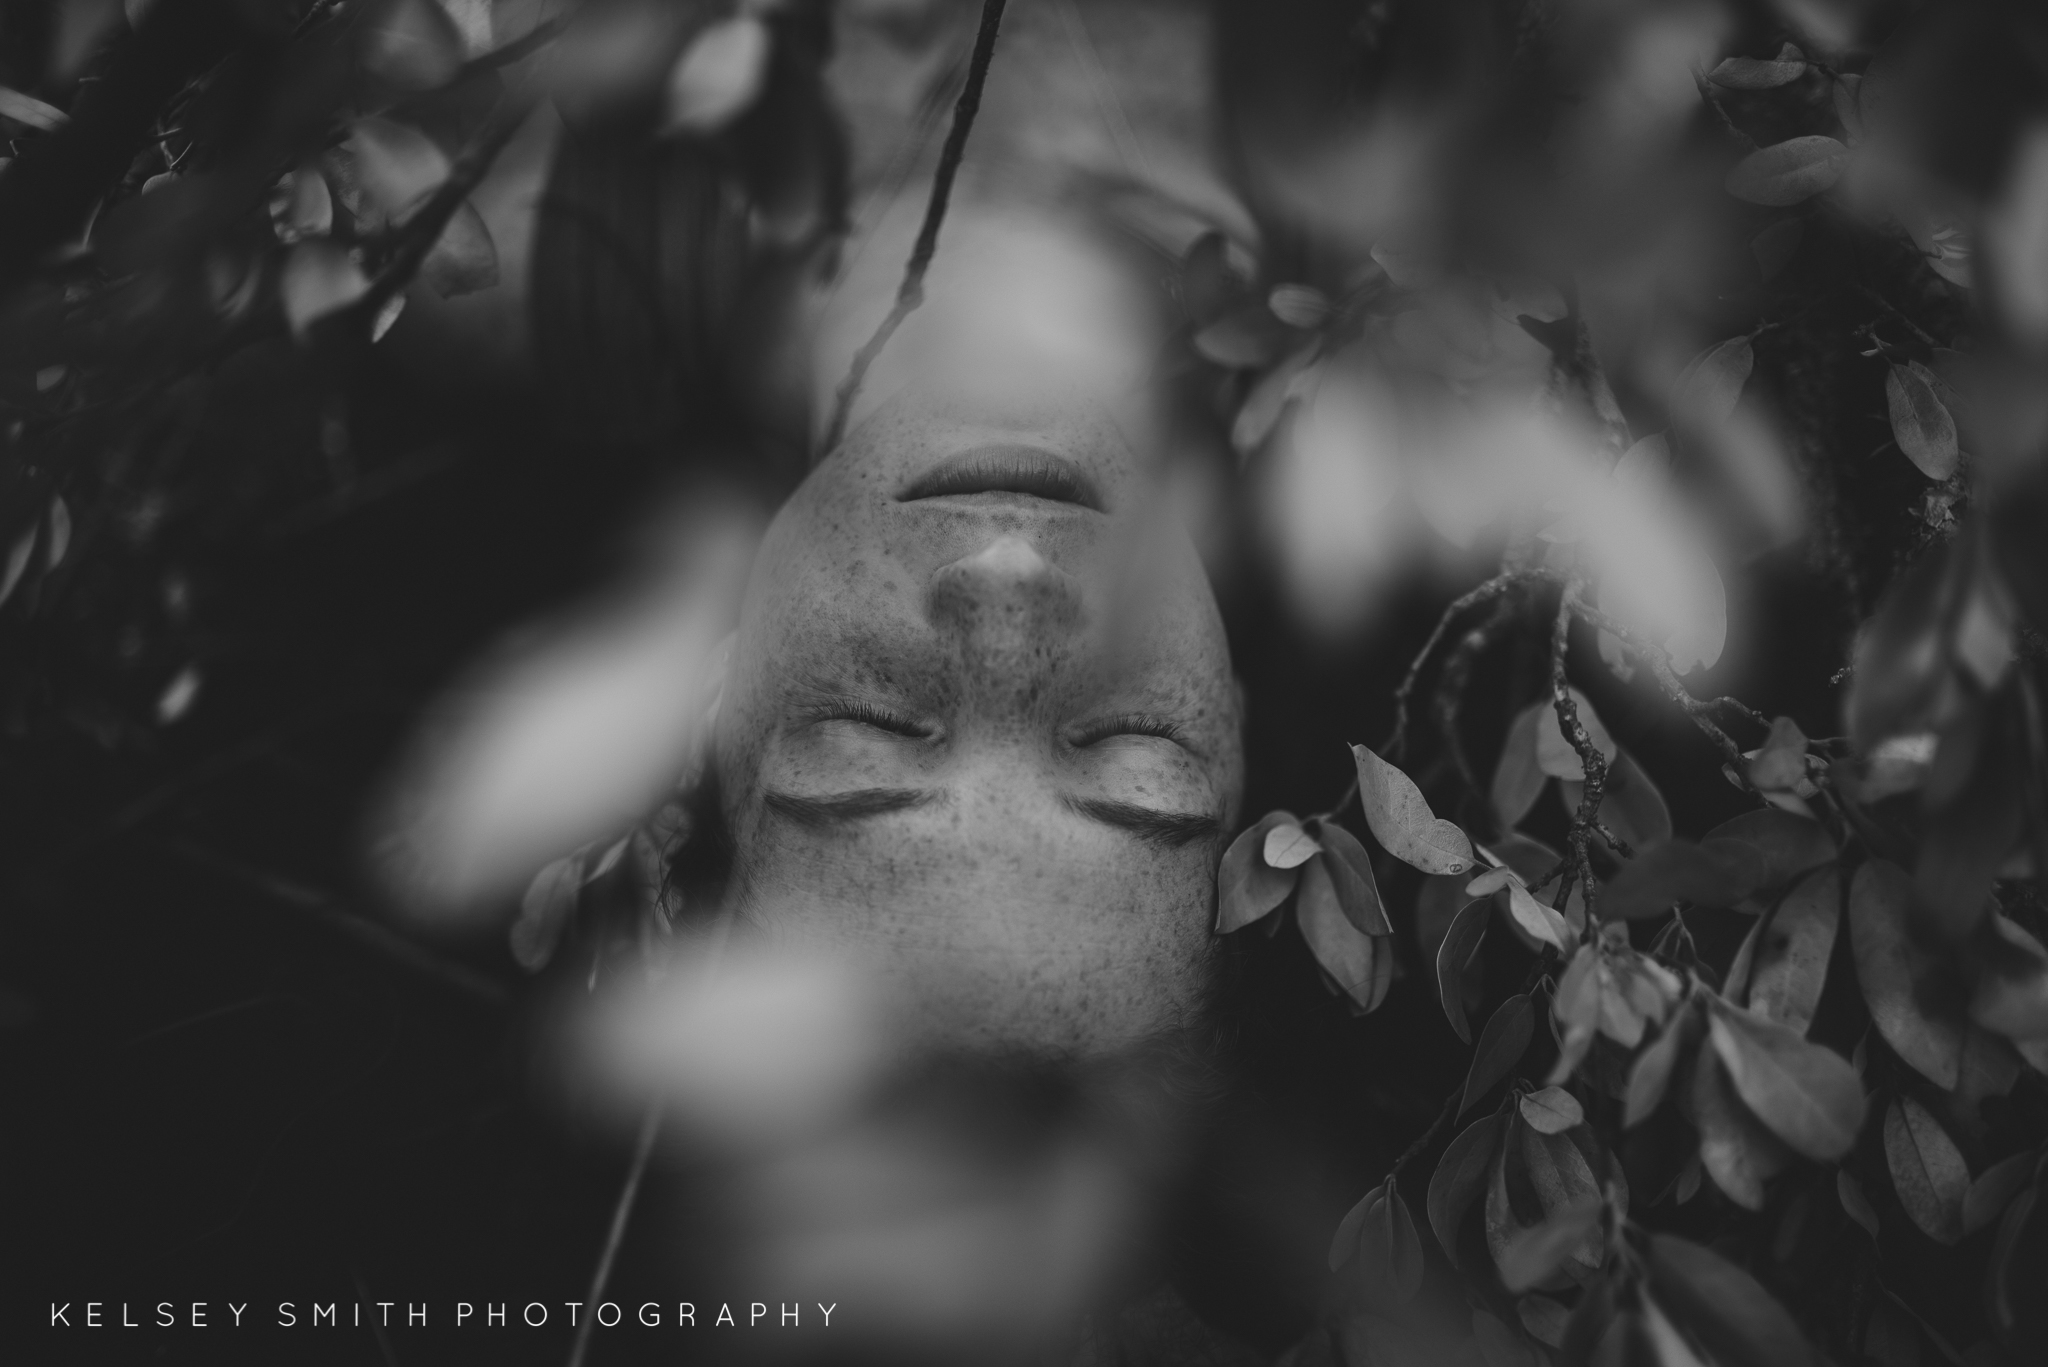 TheDeadTreeSociety_KelseySmithPhotography (Web Resolution)-24.jpg